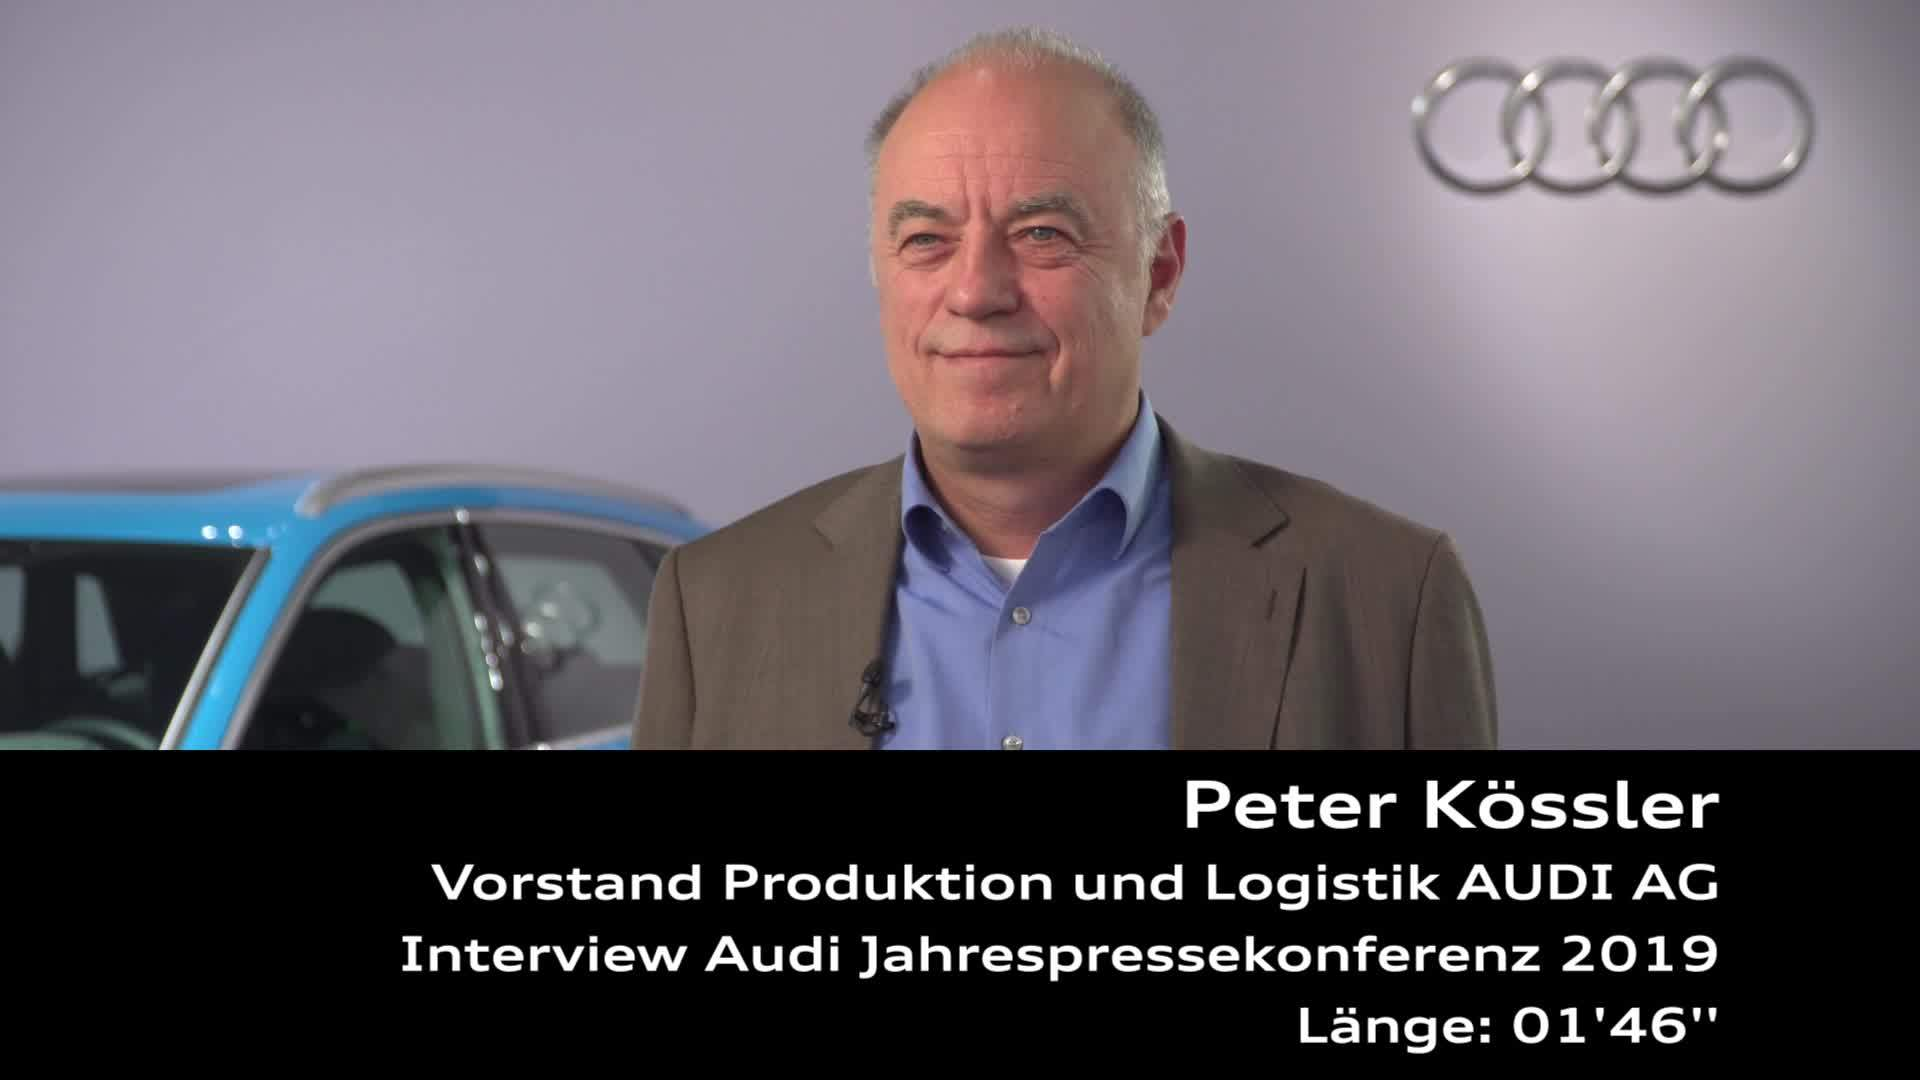 Audi Jahrespressekonferenz 2019 Interview Peter Kössler